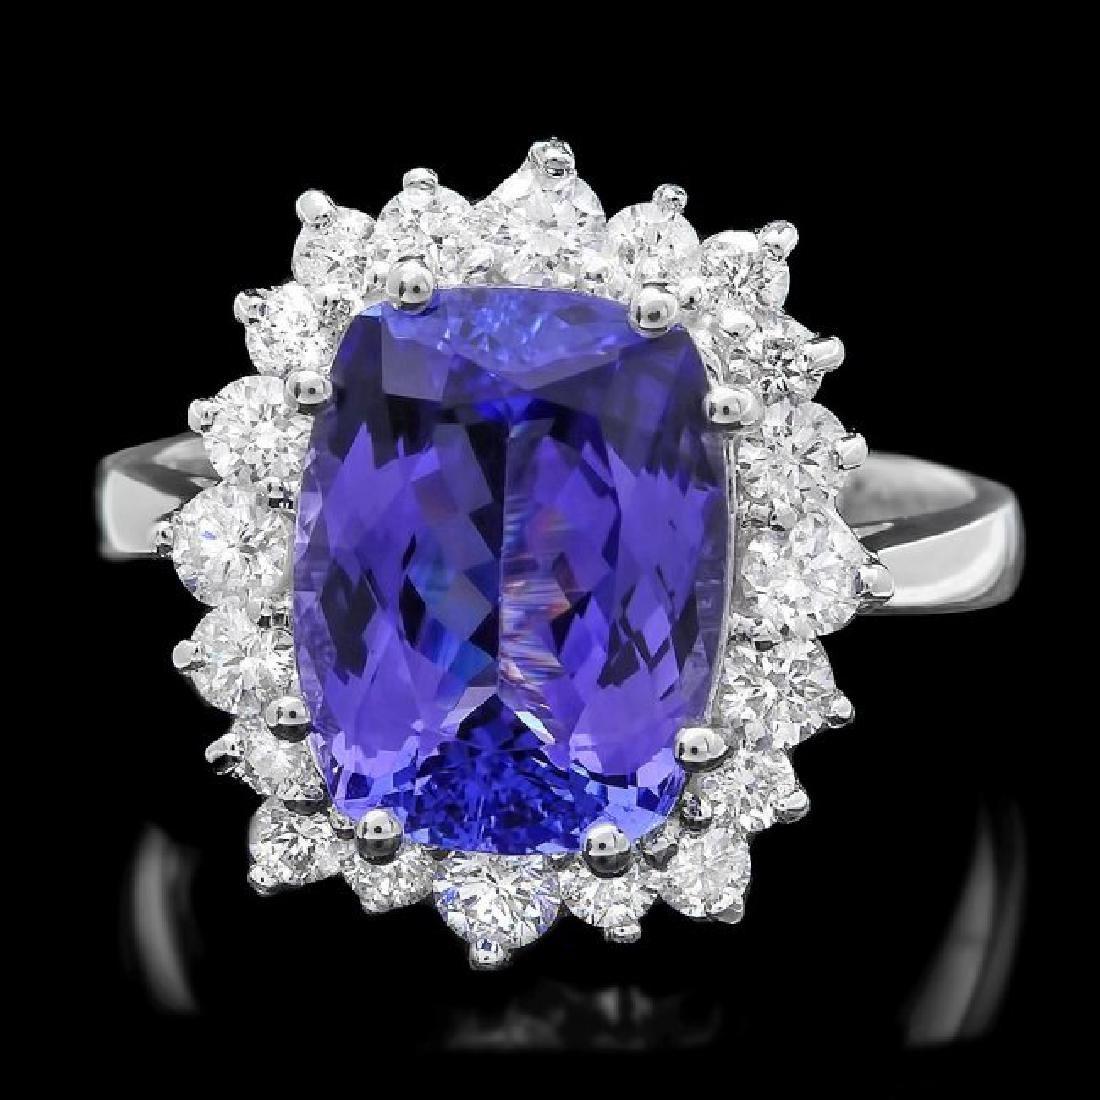 14k Gold 5.0ct Tanzanite 0.85ct Diamond Ring